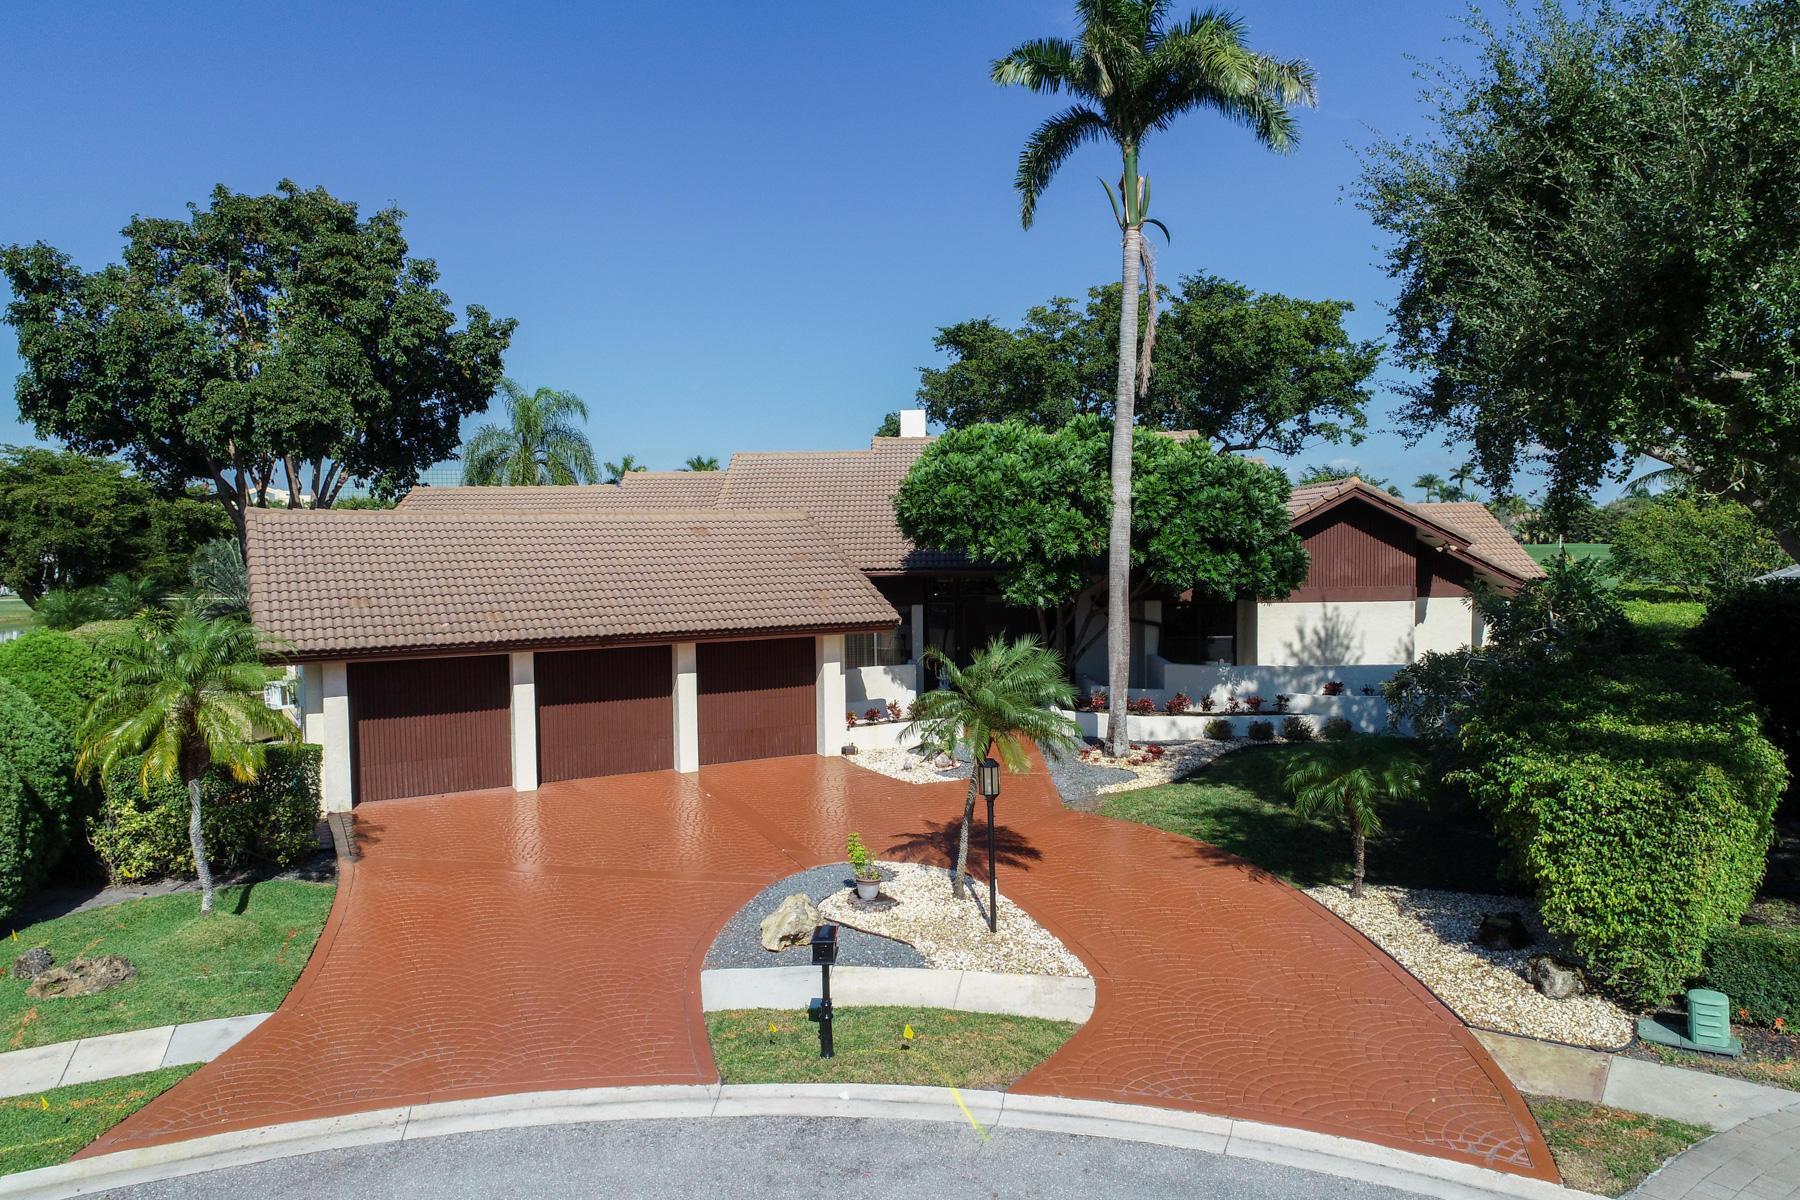 21188 Bellechasse Court  Boca Raton, FL 33433